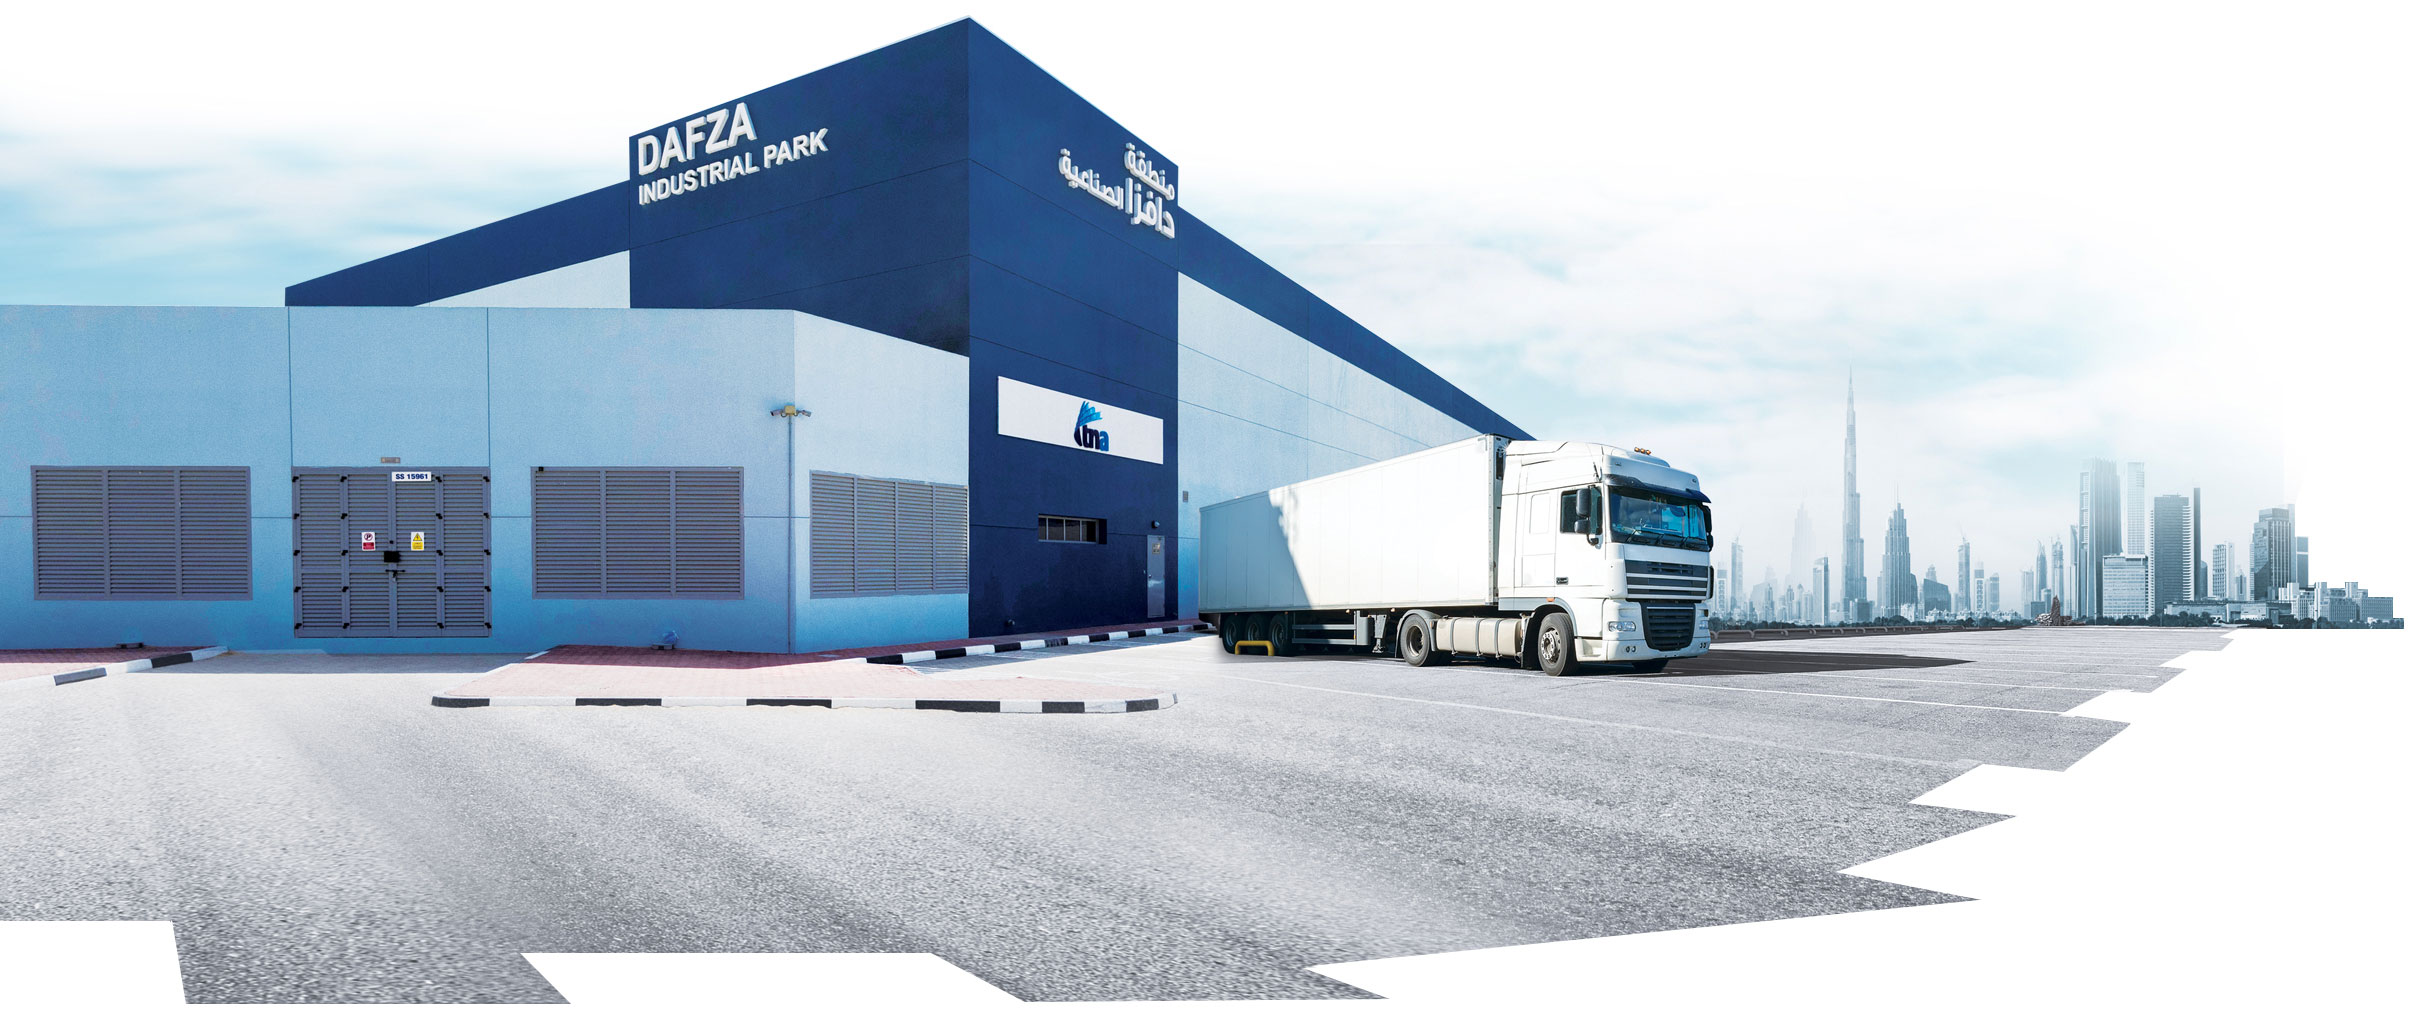 Industrial Park DAFZA Services